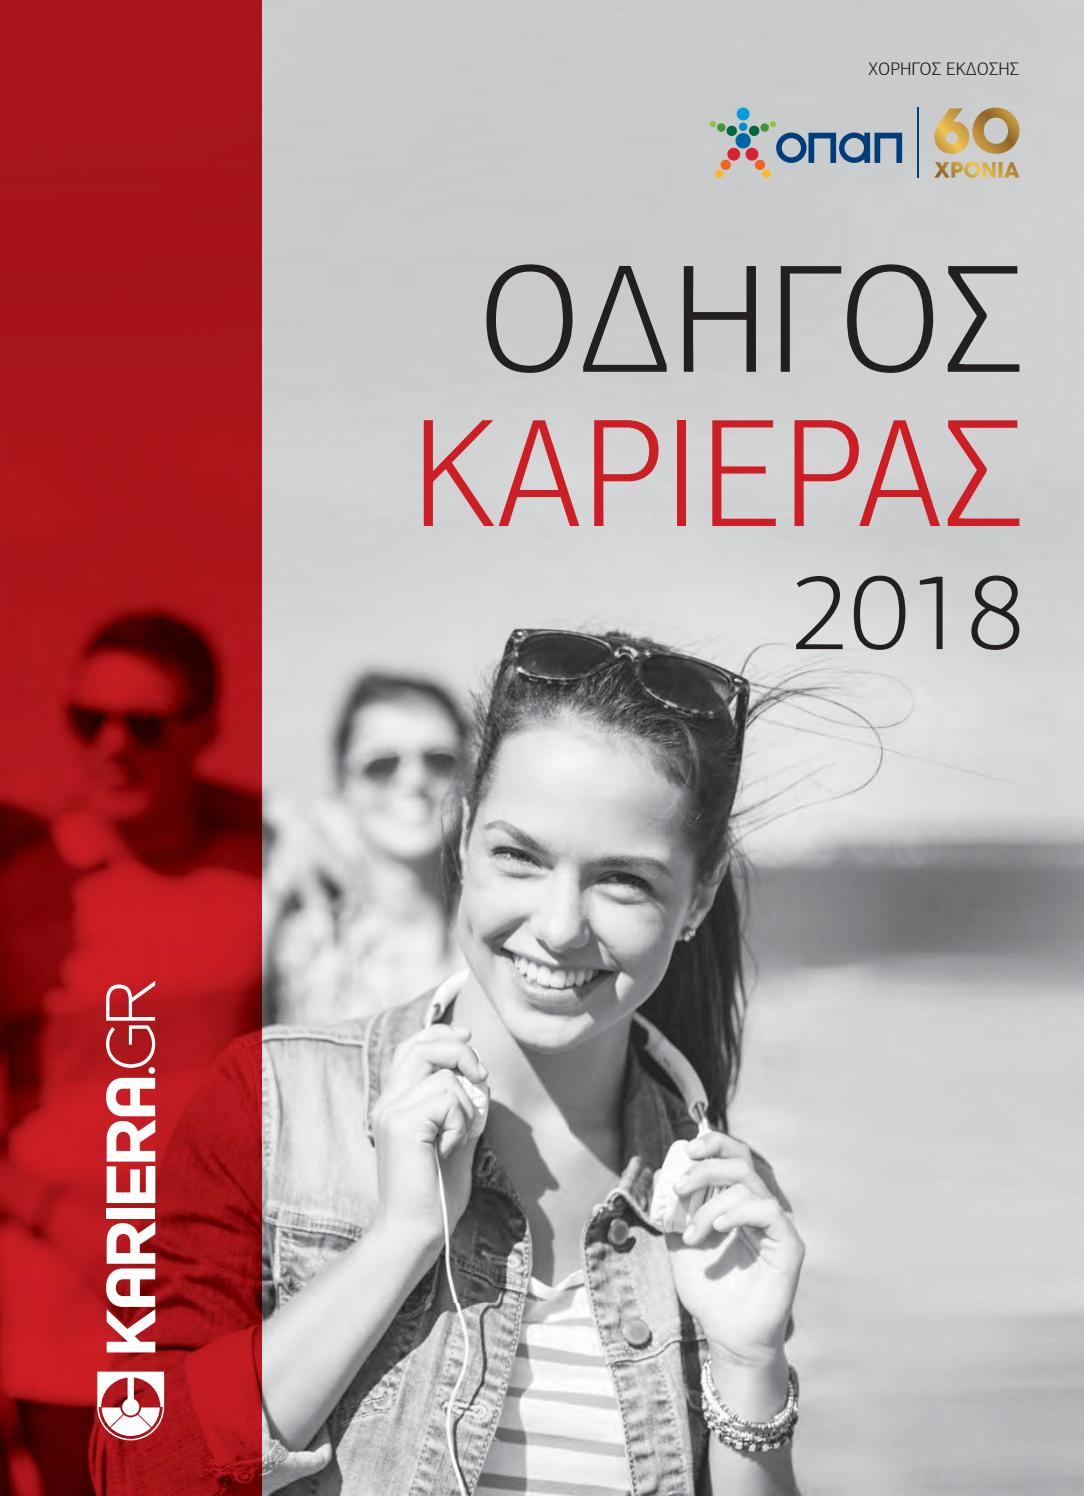 Careerguide 2018 by kariera.gr - issuu 833b6c9c11f